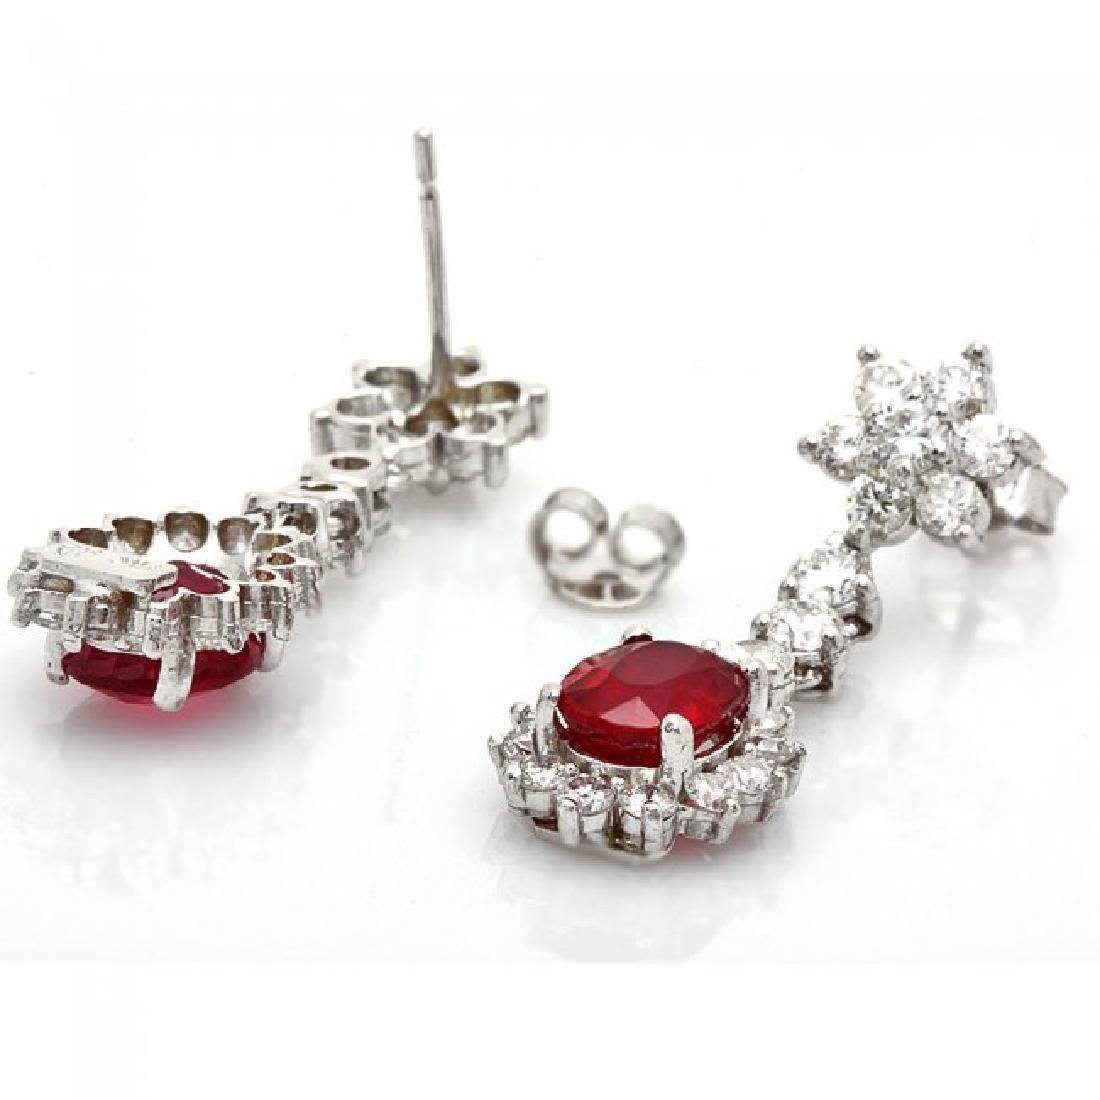 14k Gold 4.00ct Ruby 2.50ct Diamond Earrings - 2